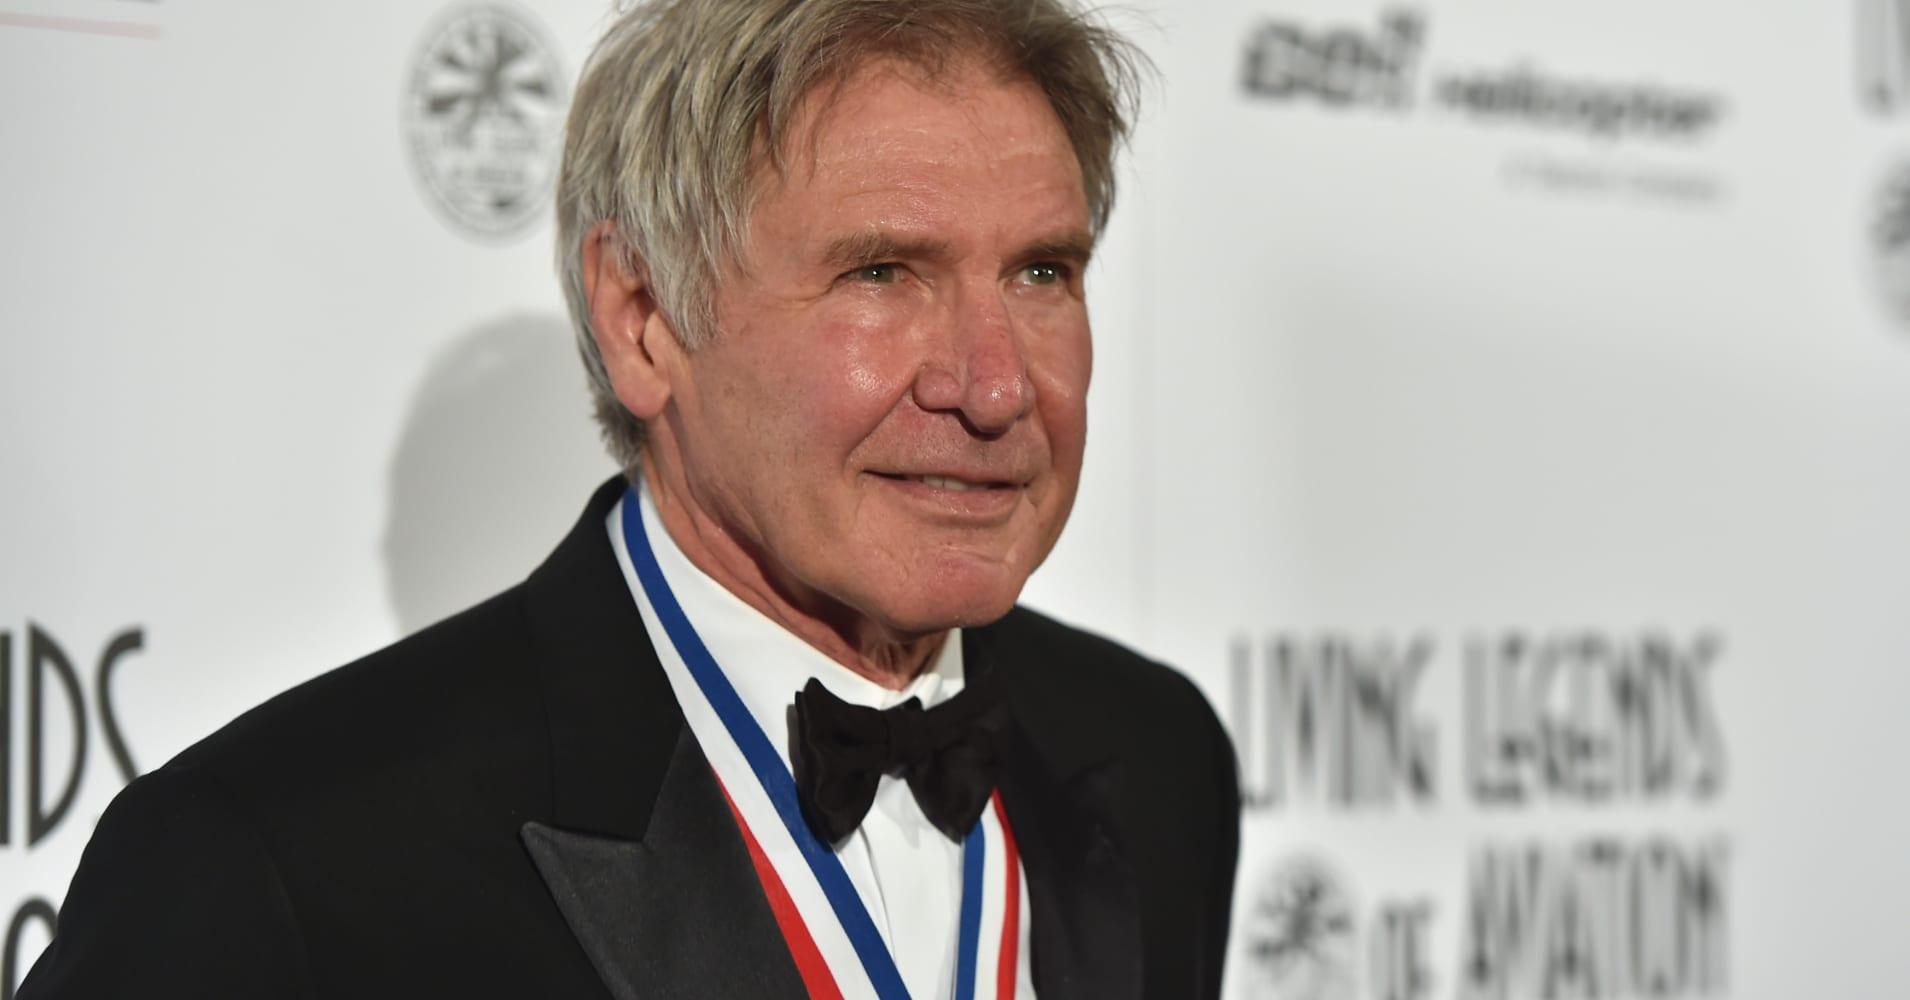 Star Wars star Harrison Ford called himself a 'schmuck' after plane incident